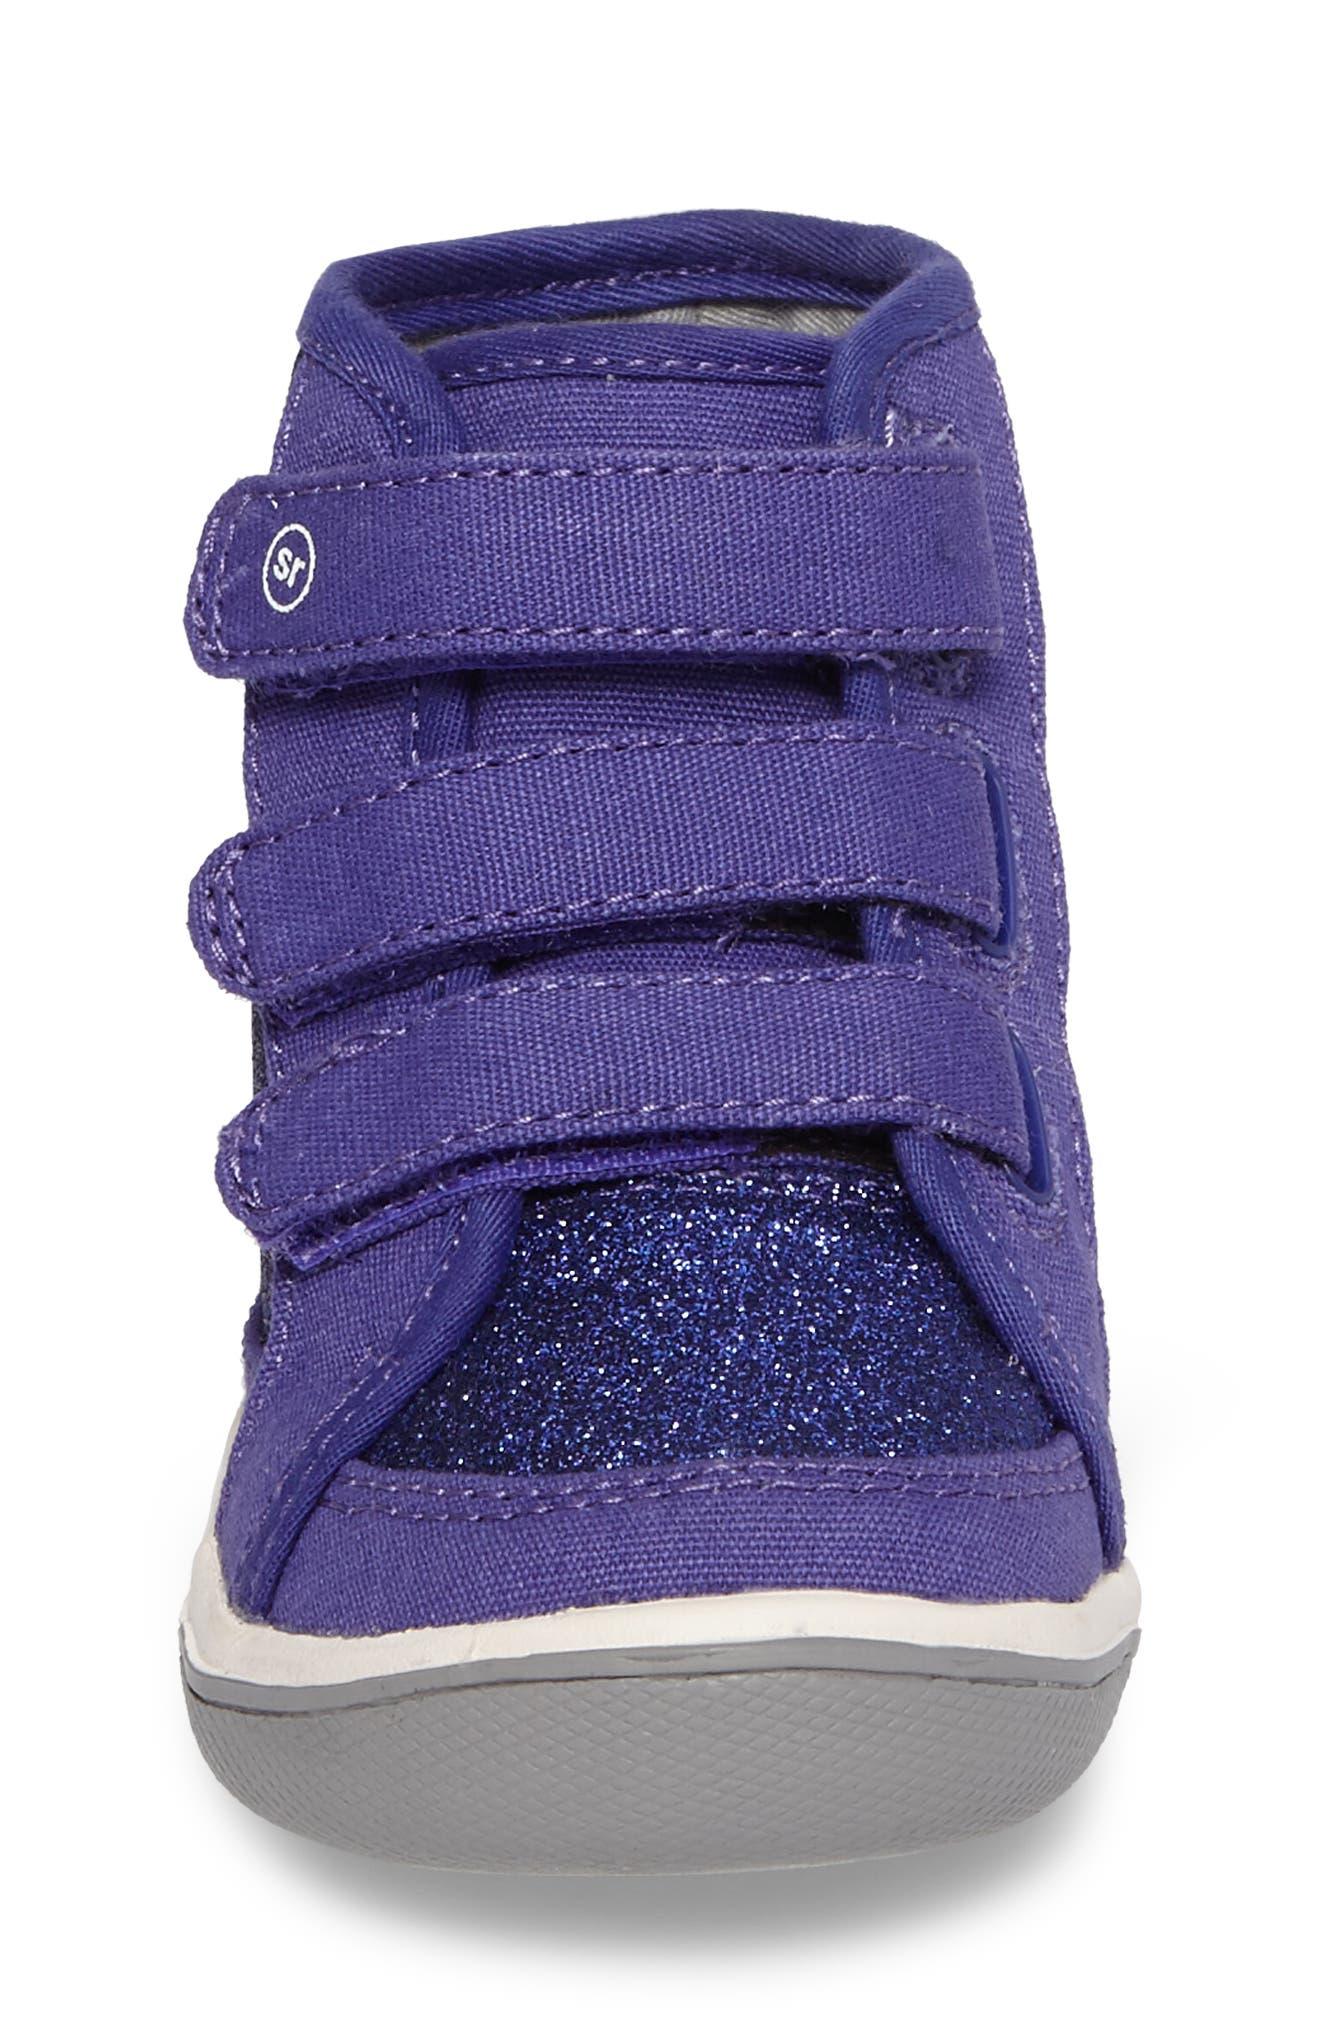 Alternate Image 4  - Stride Rite Ellis Glitter High Top Sneaker (Baby, Walker & Toddler)